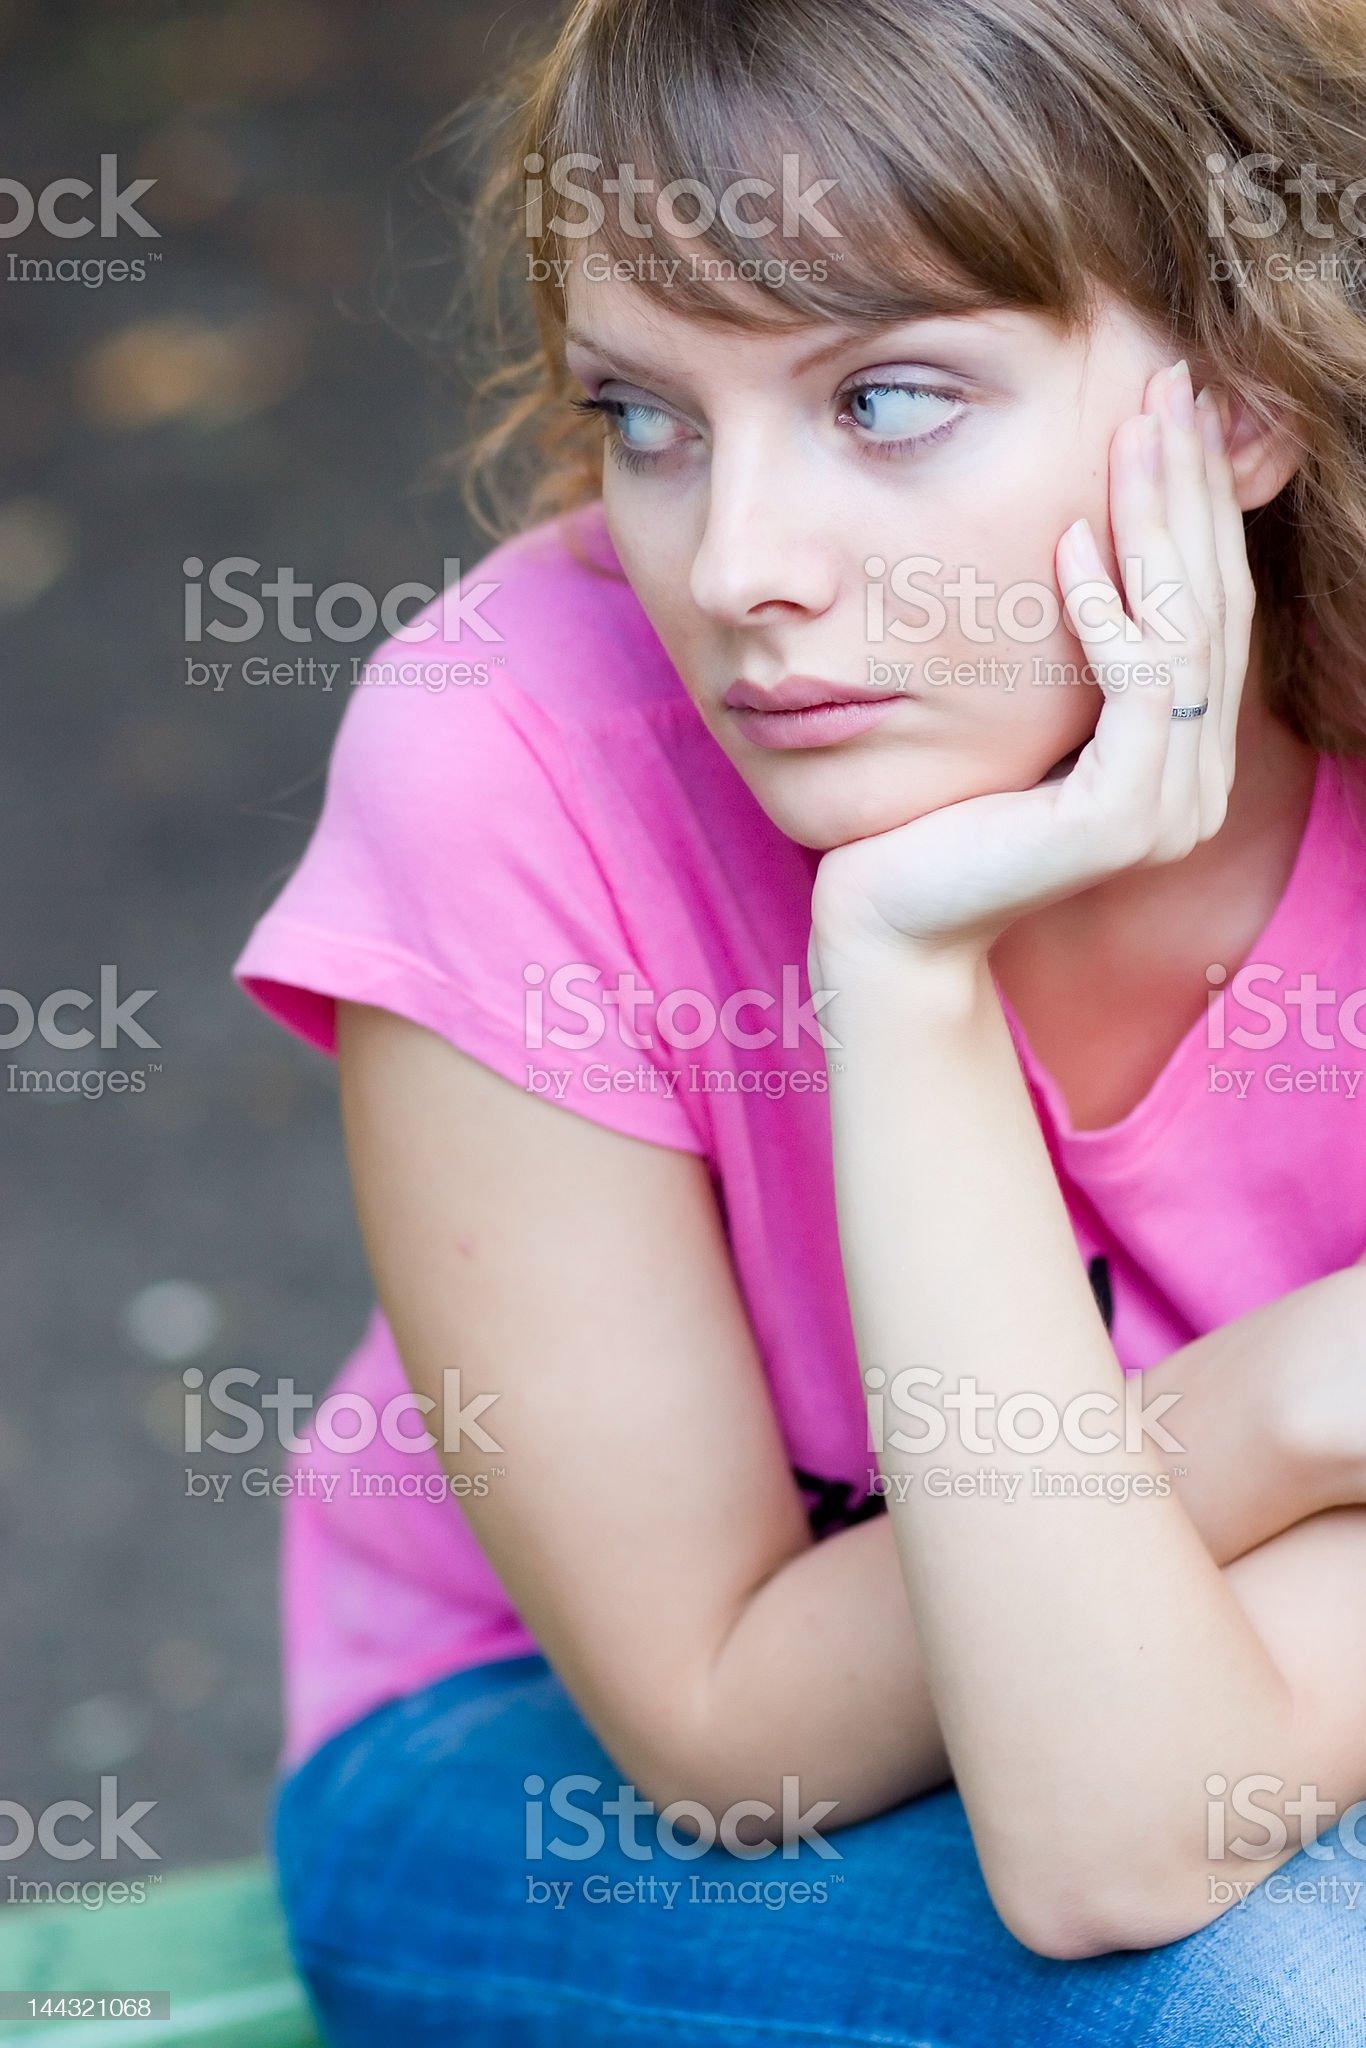 Pencive girl royalty-free stock photo